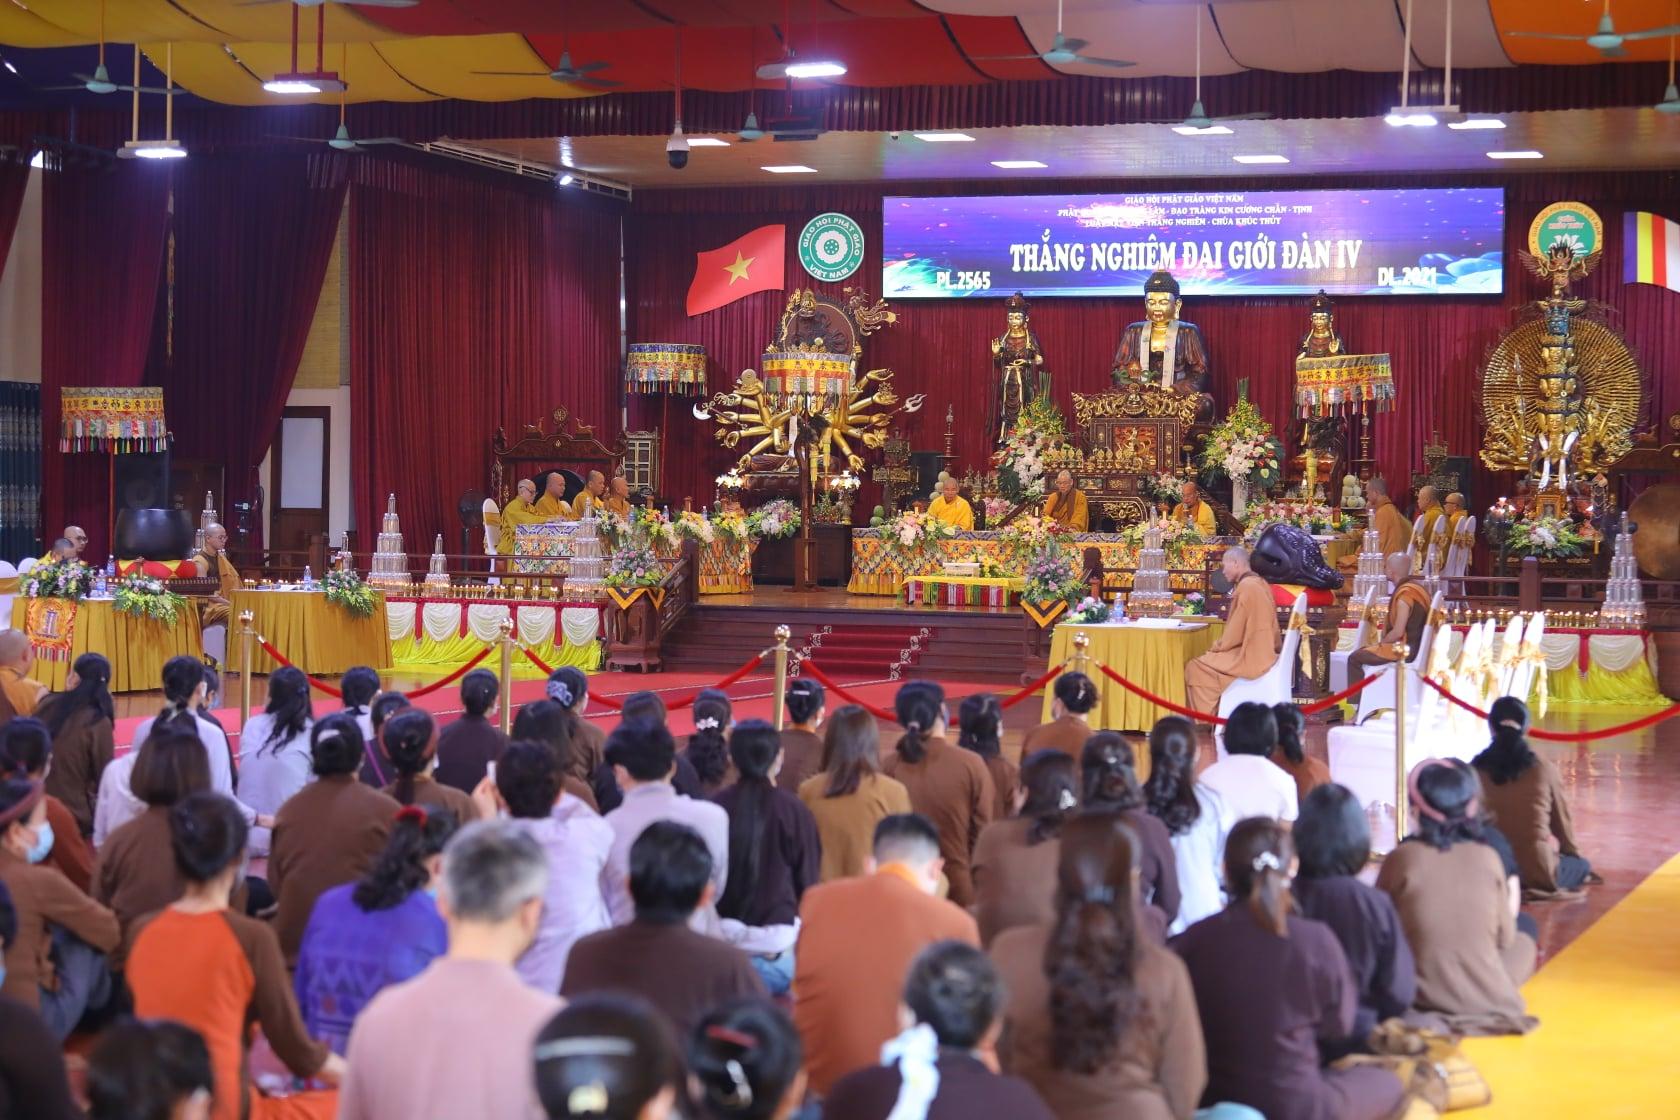 Thang Nghiem Dai Gioi Dan IV (41)